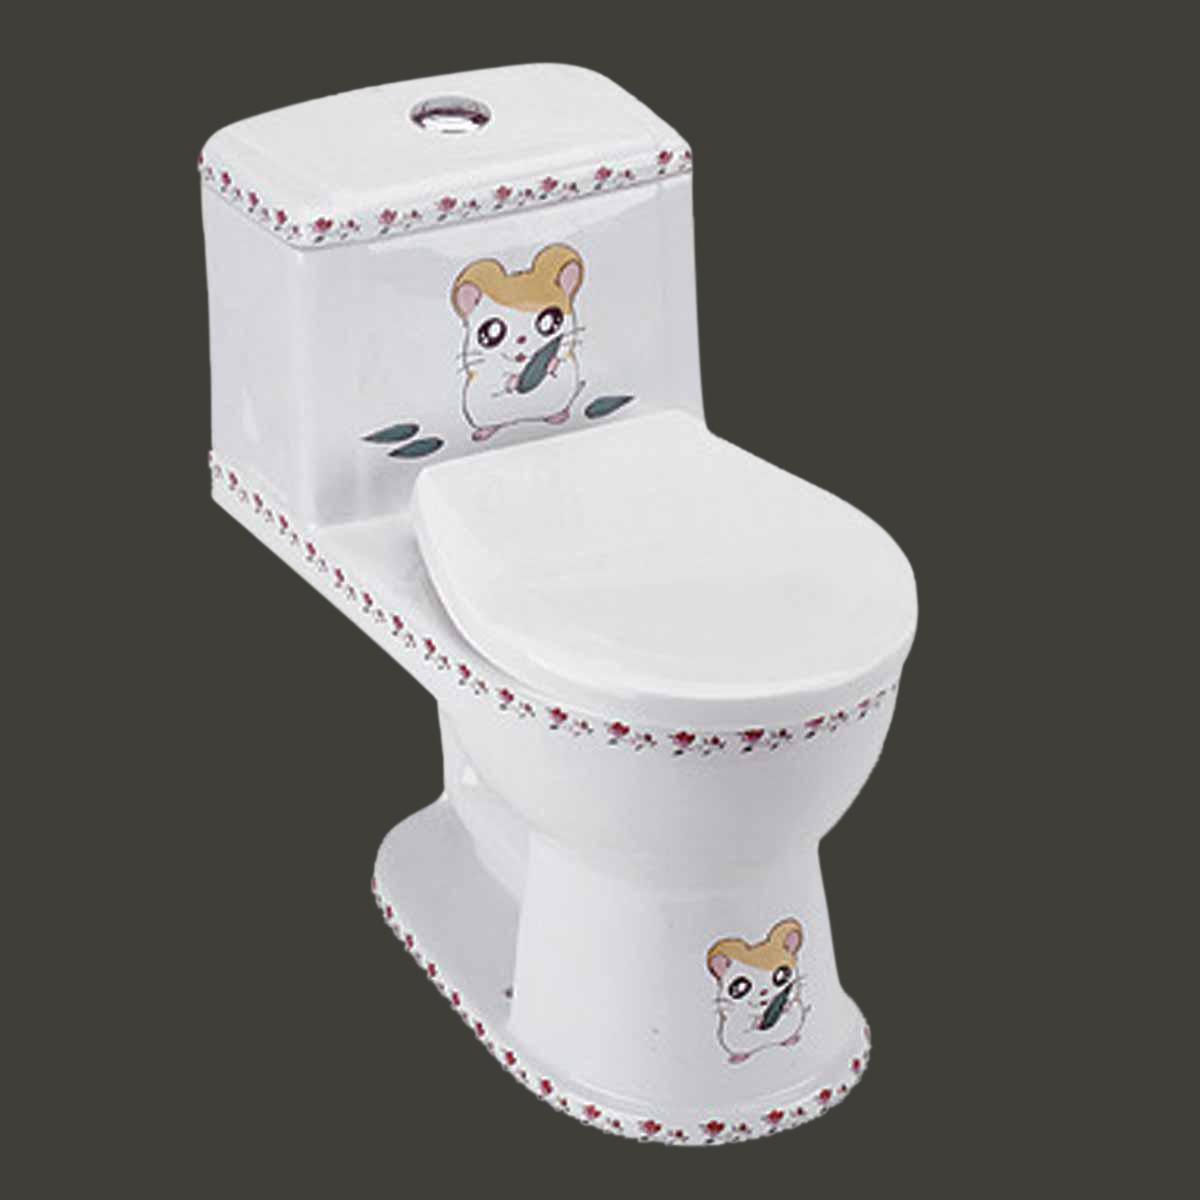 kids toilet children bathroom loo potty training mouse